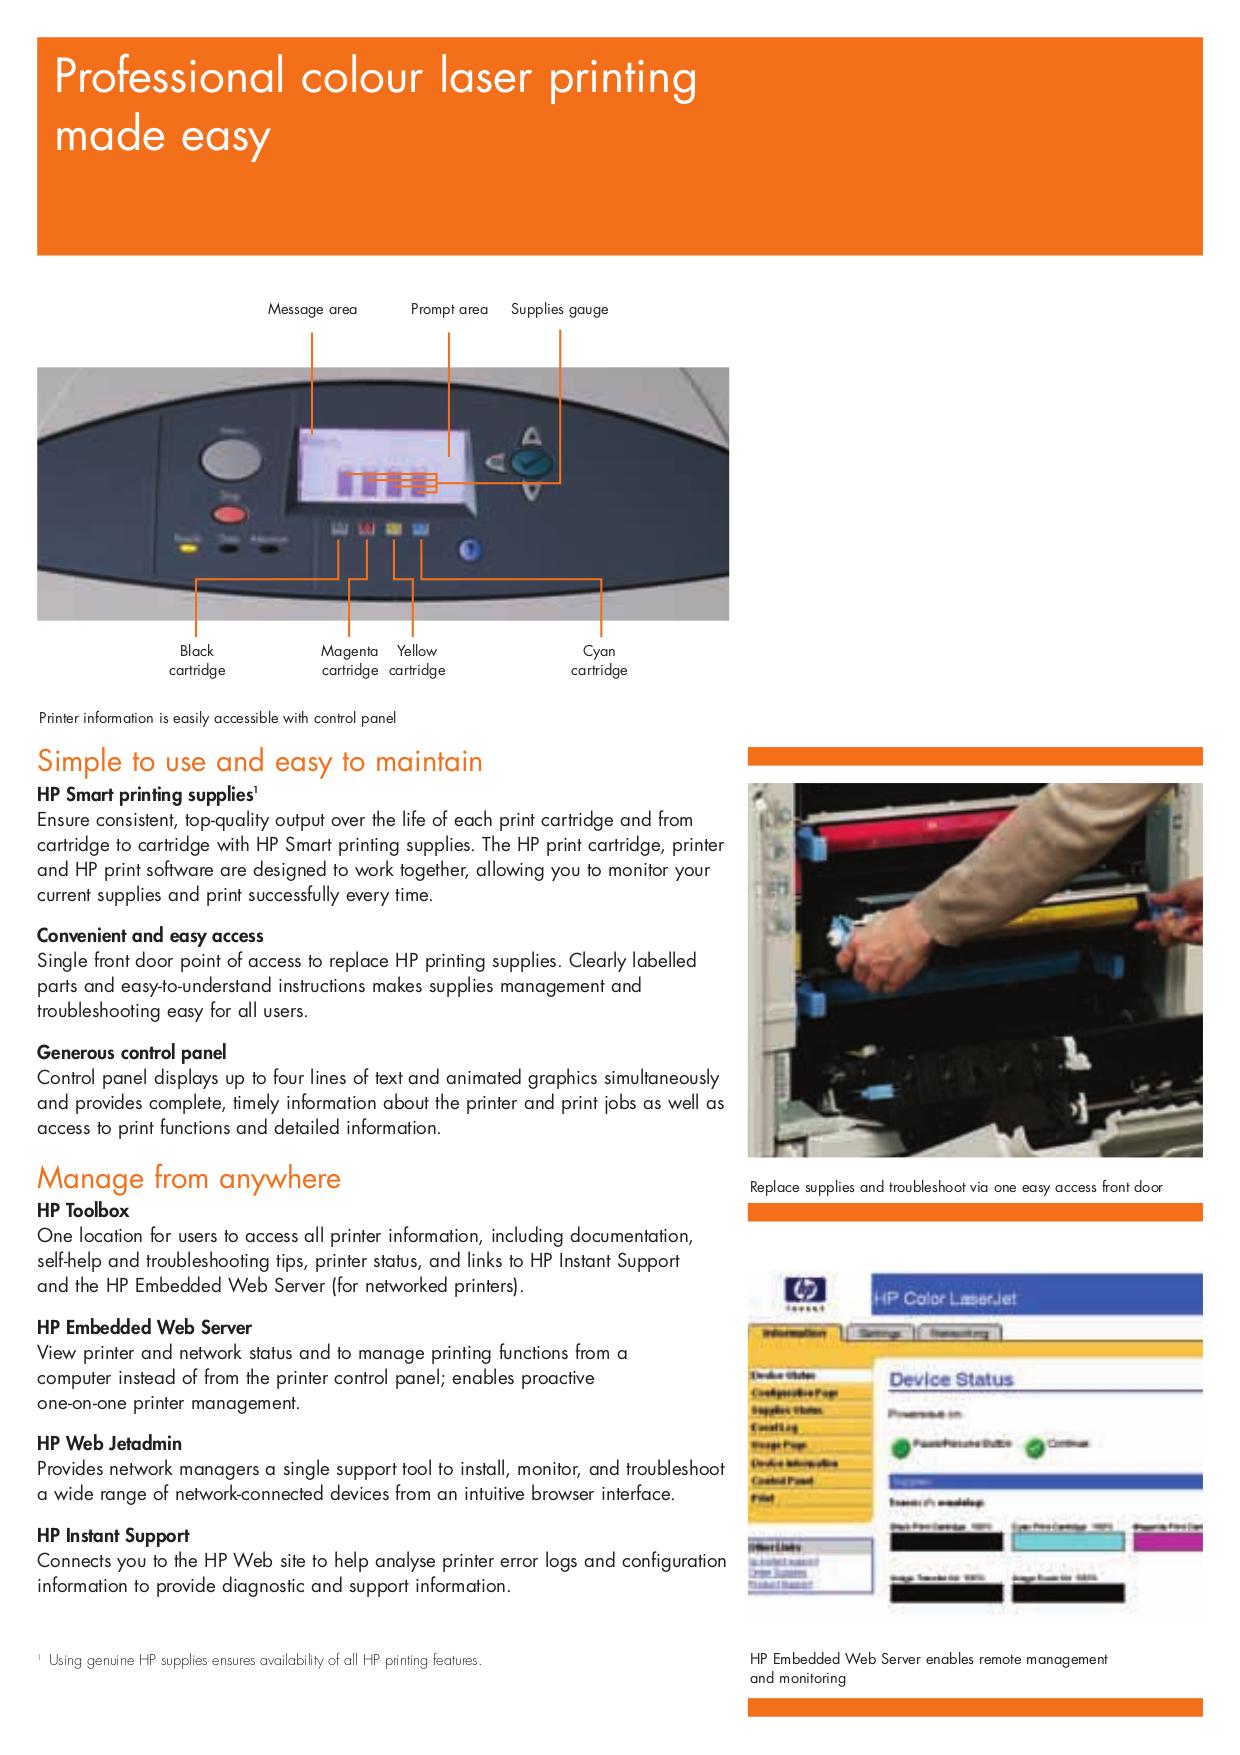 PDF manual for HP Printer Laserjet,Color Laserjet 5550n